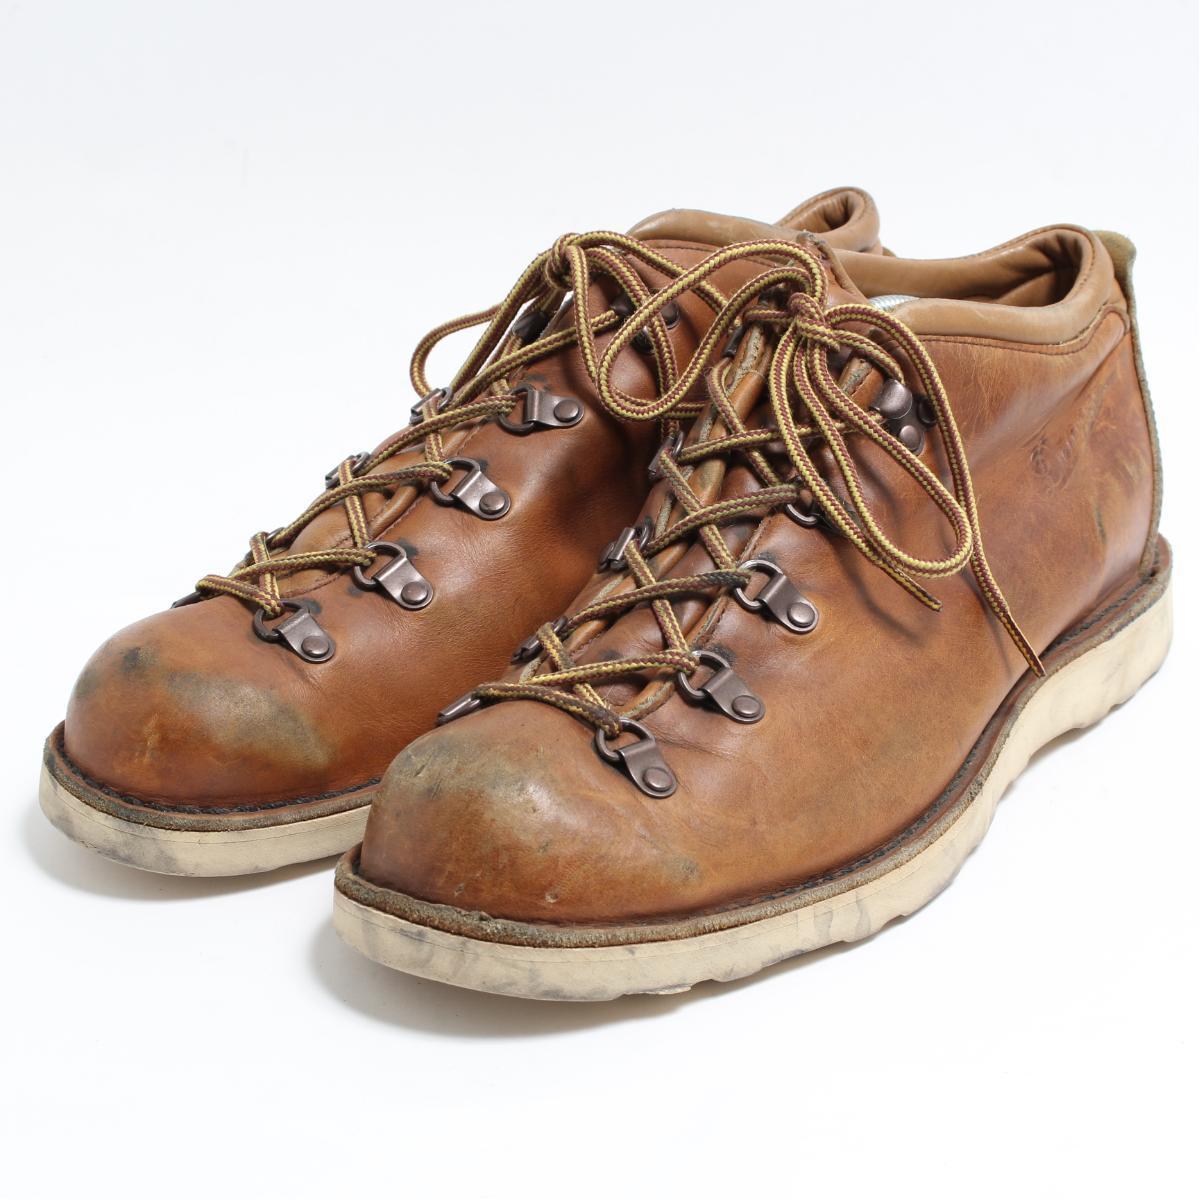 f7ccba48ab48 11EE men 29.0cm  bon6773 made in Danner DANNER 54302 Tramline mountain  boots USA